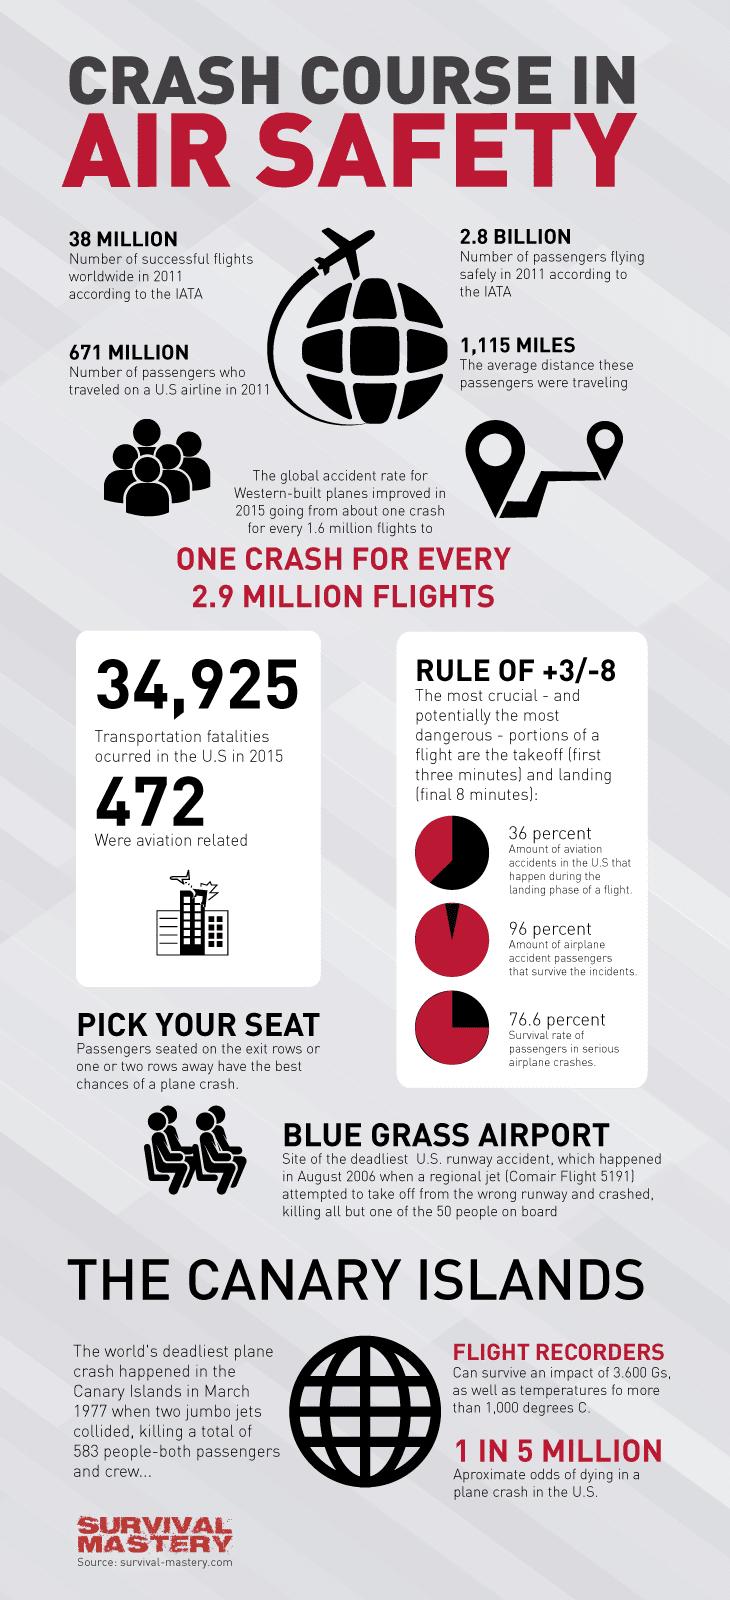 Crash course infographic